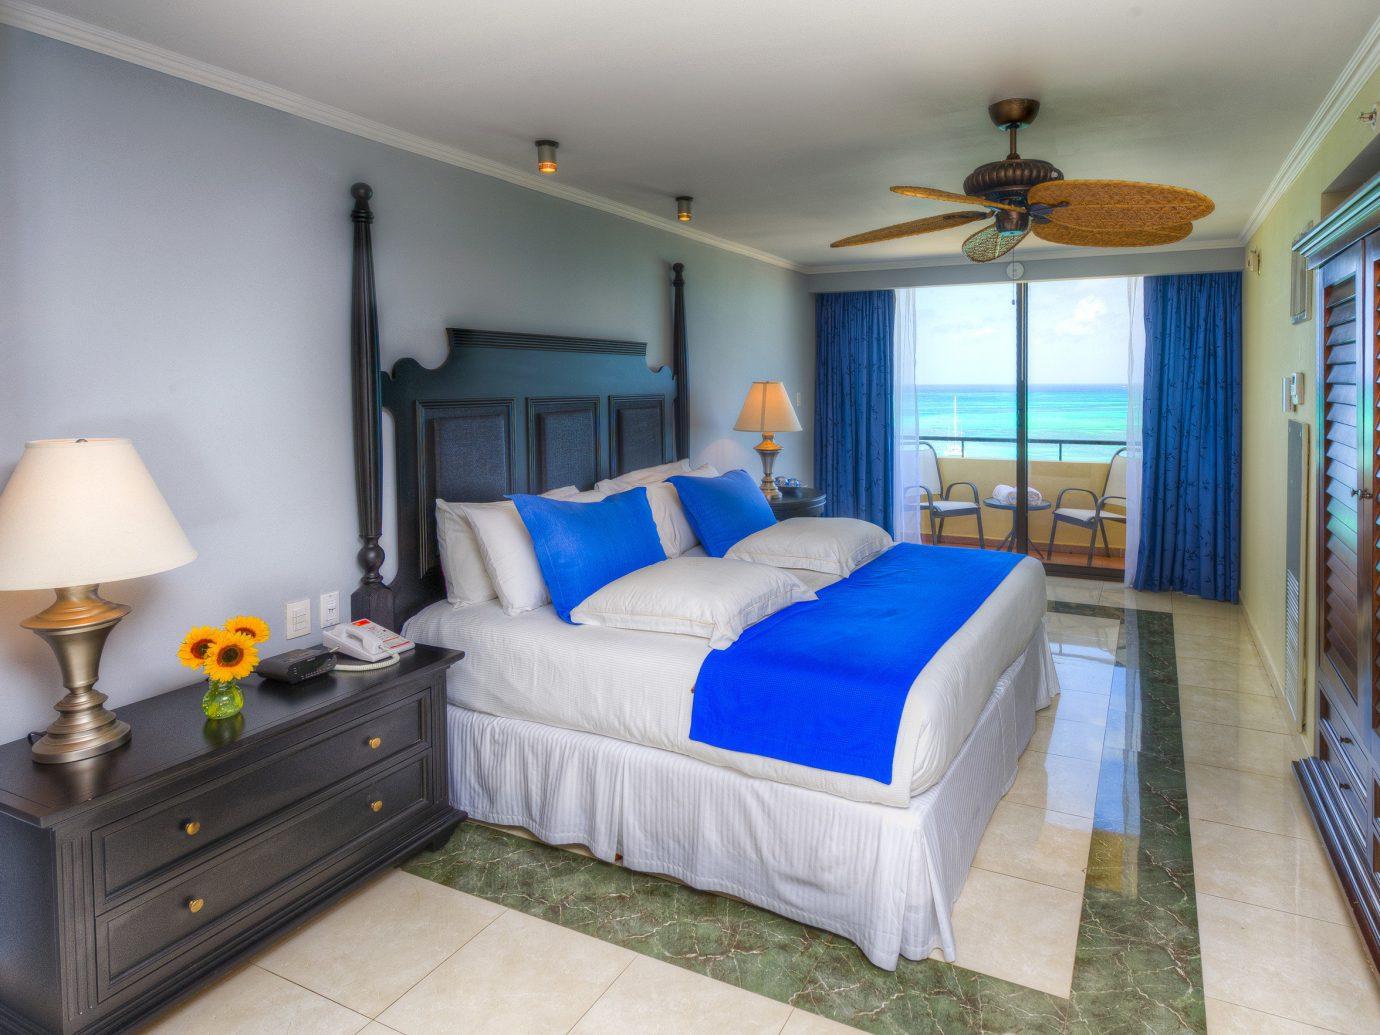 Hotels indoor wall floor room property ceiling Bedroom bed estate real estate Suite cottage interior design Villa furniture apartment area